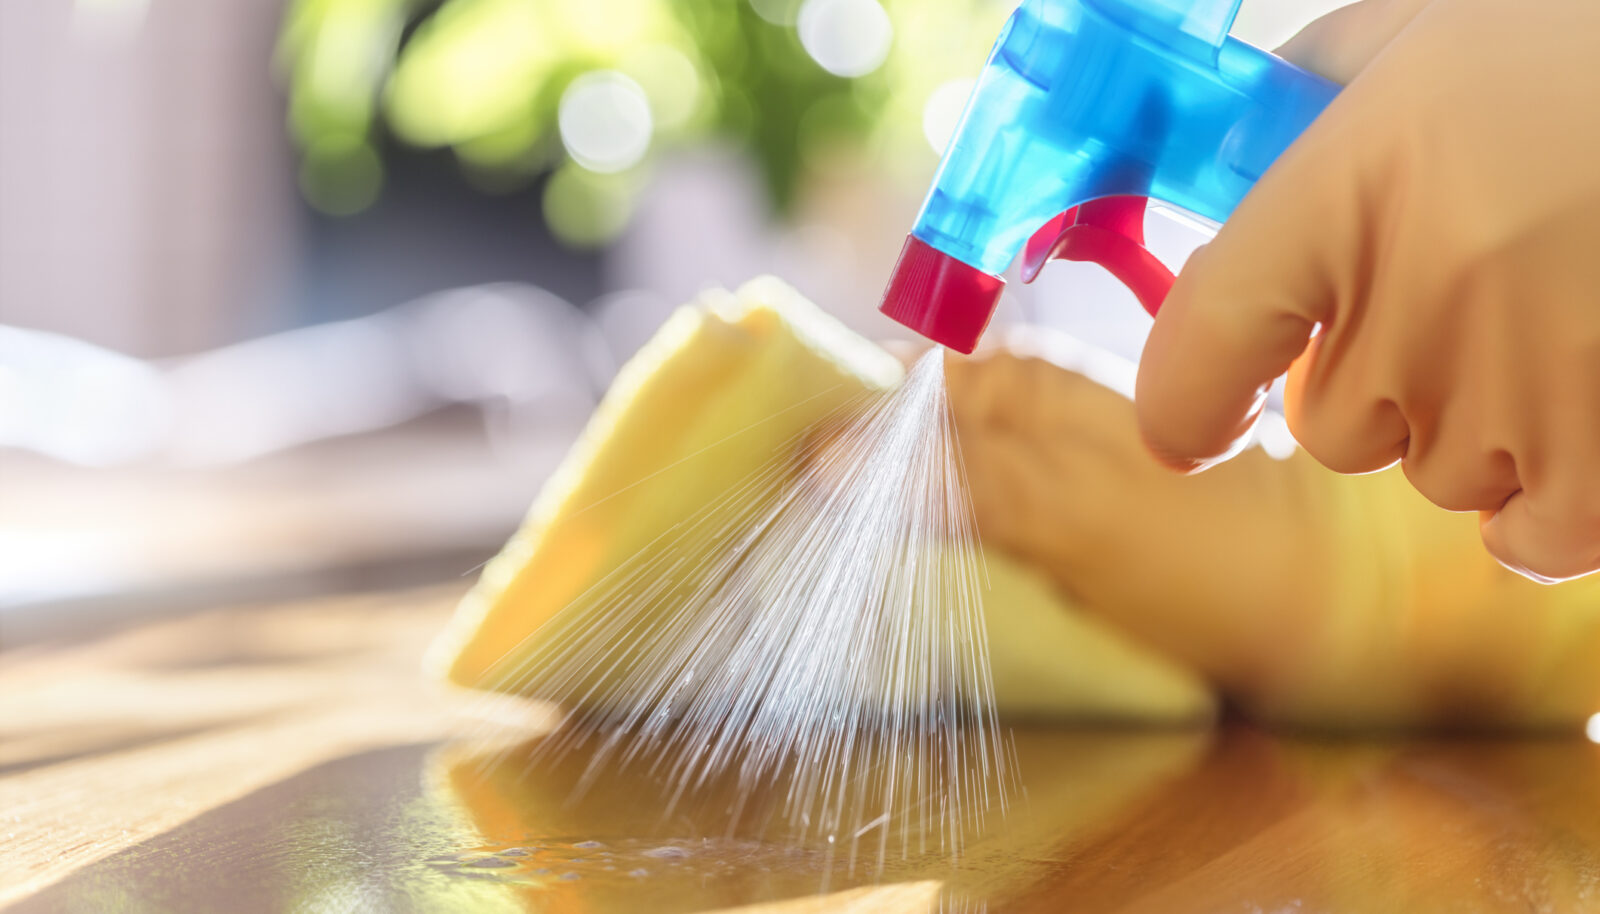 Cleaning & Sanitation Protocol